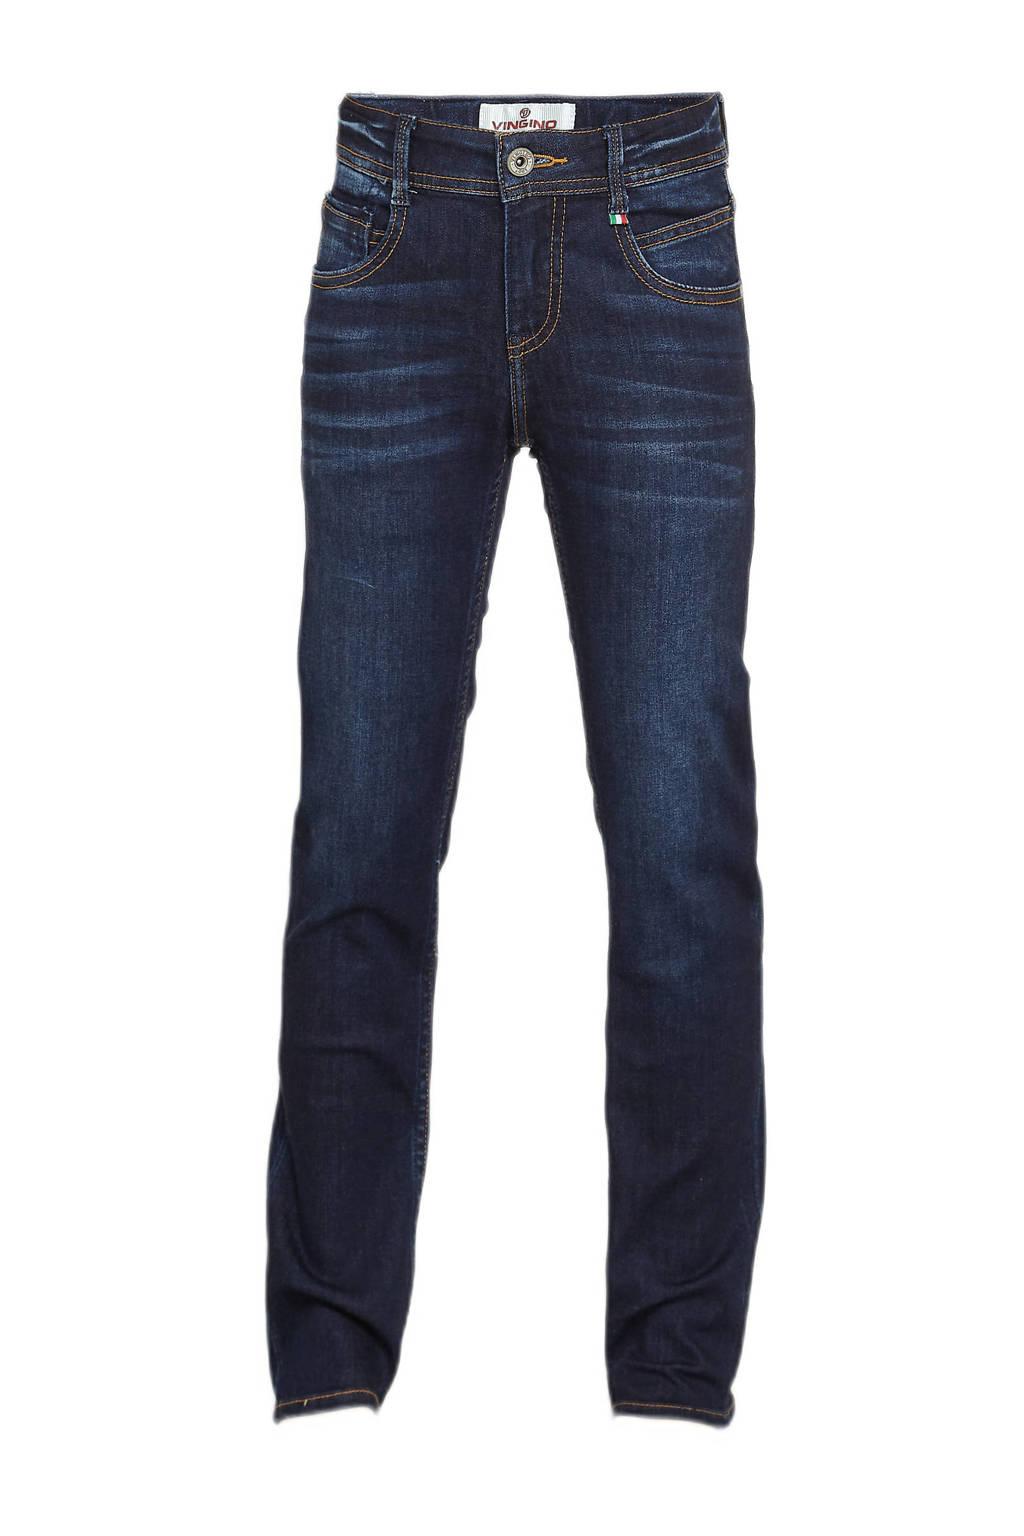 Vingino regular fit jeans Benvolio mid blue wash, Mid Blue Wash